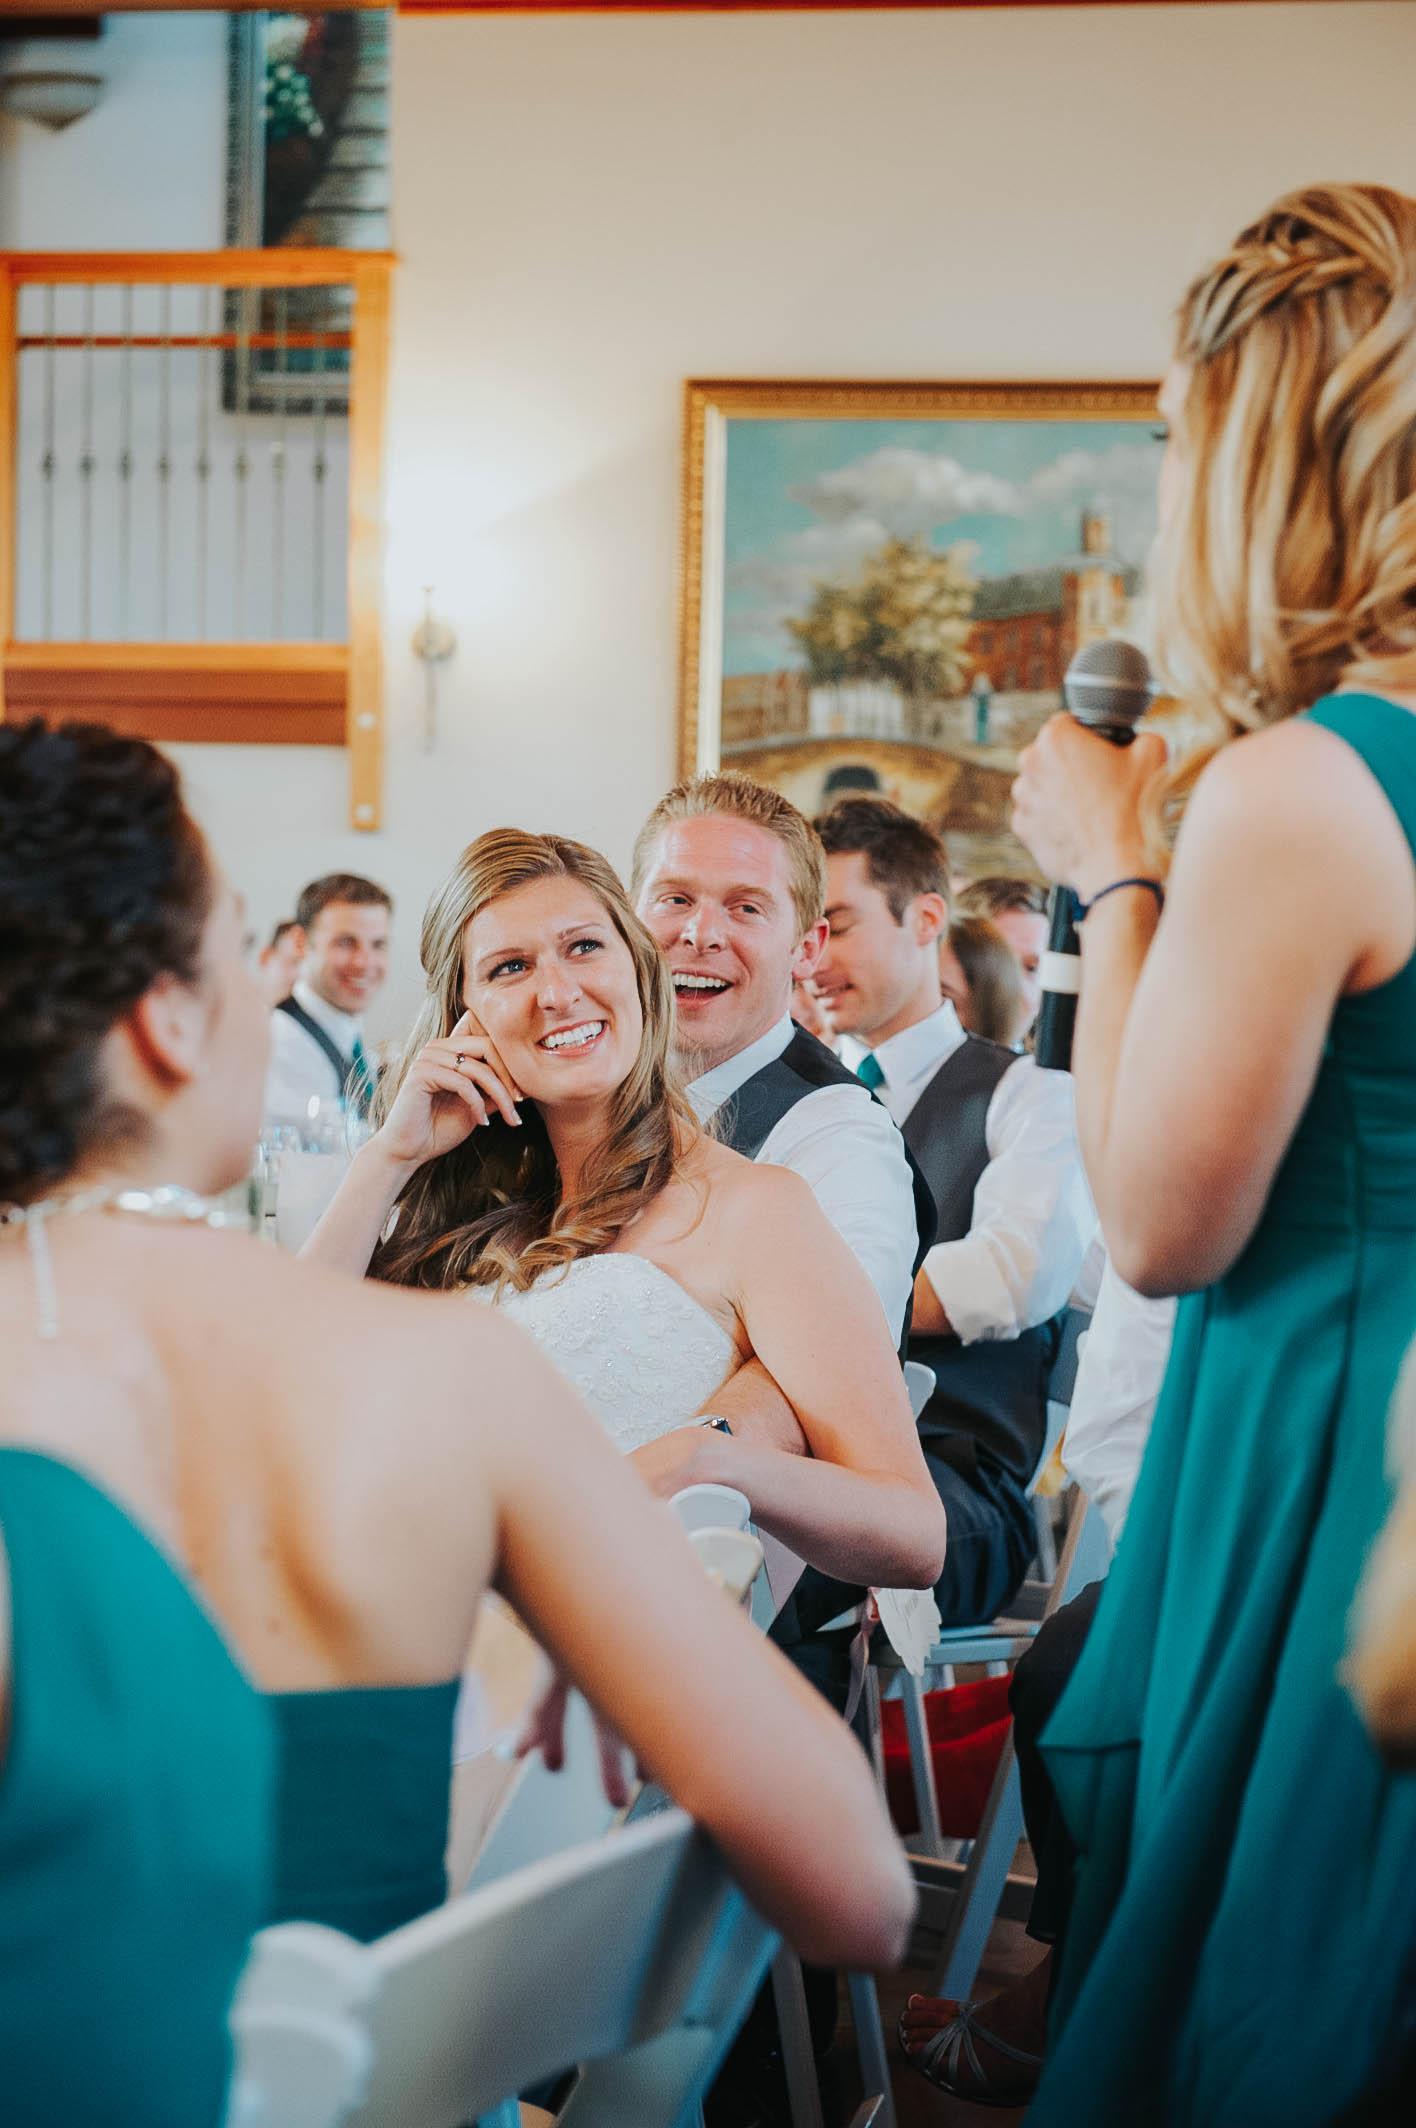 Whidbey-Island-Wedding-Photographer-J-Hodges (14 of 23).jpg